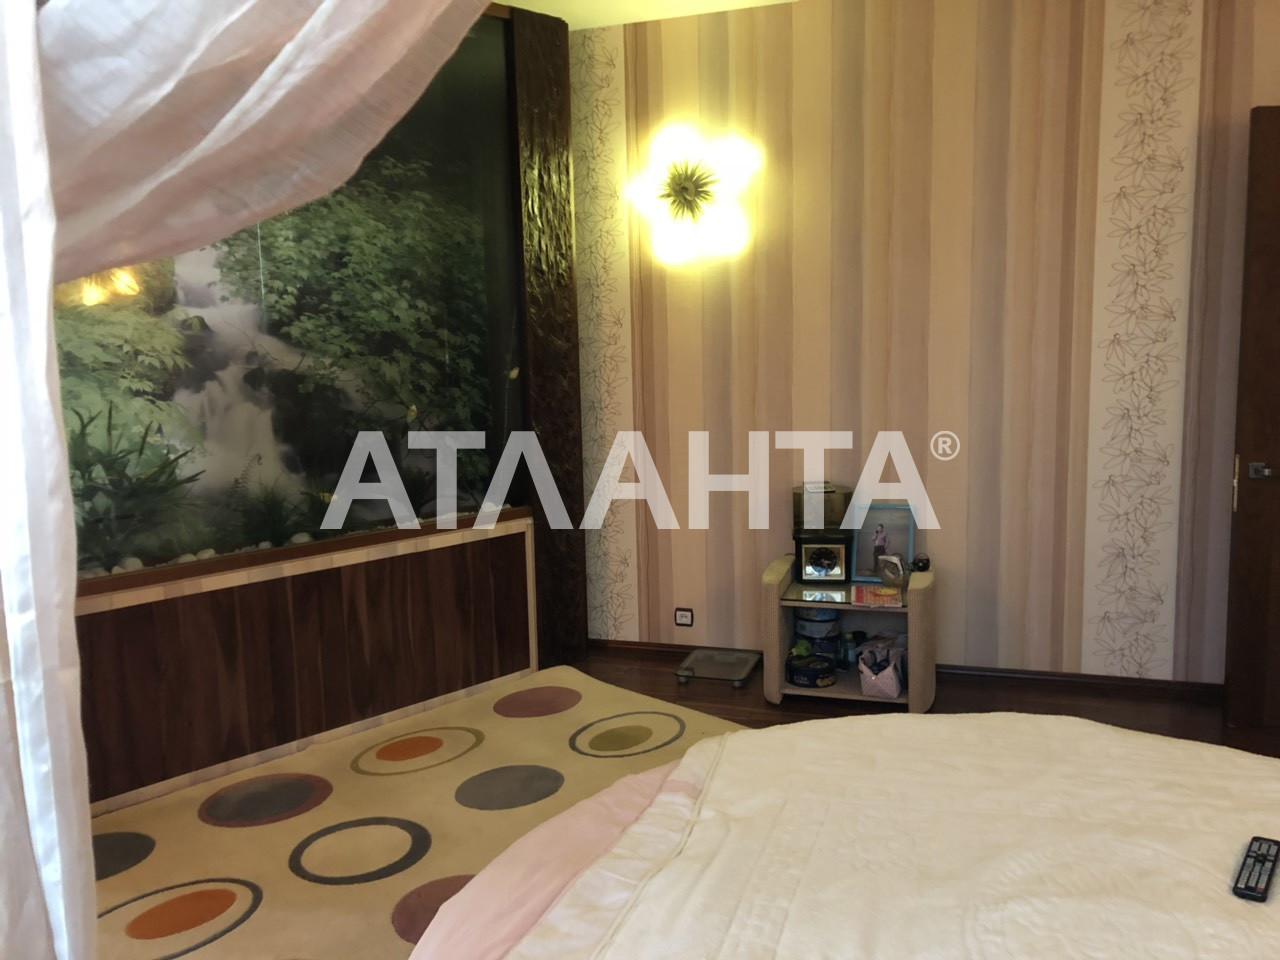 Продается 3-комнатная Квартира на ул. 1 Мая — 135 000 у.е. (фото №8)